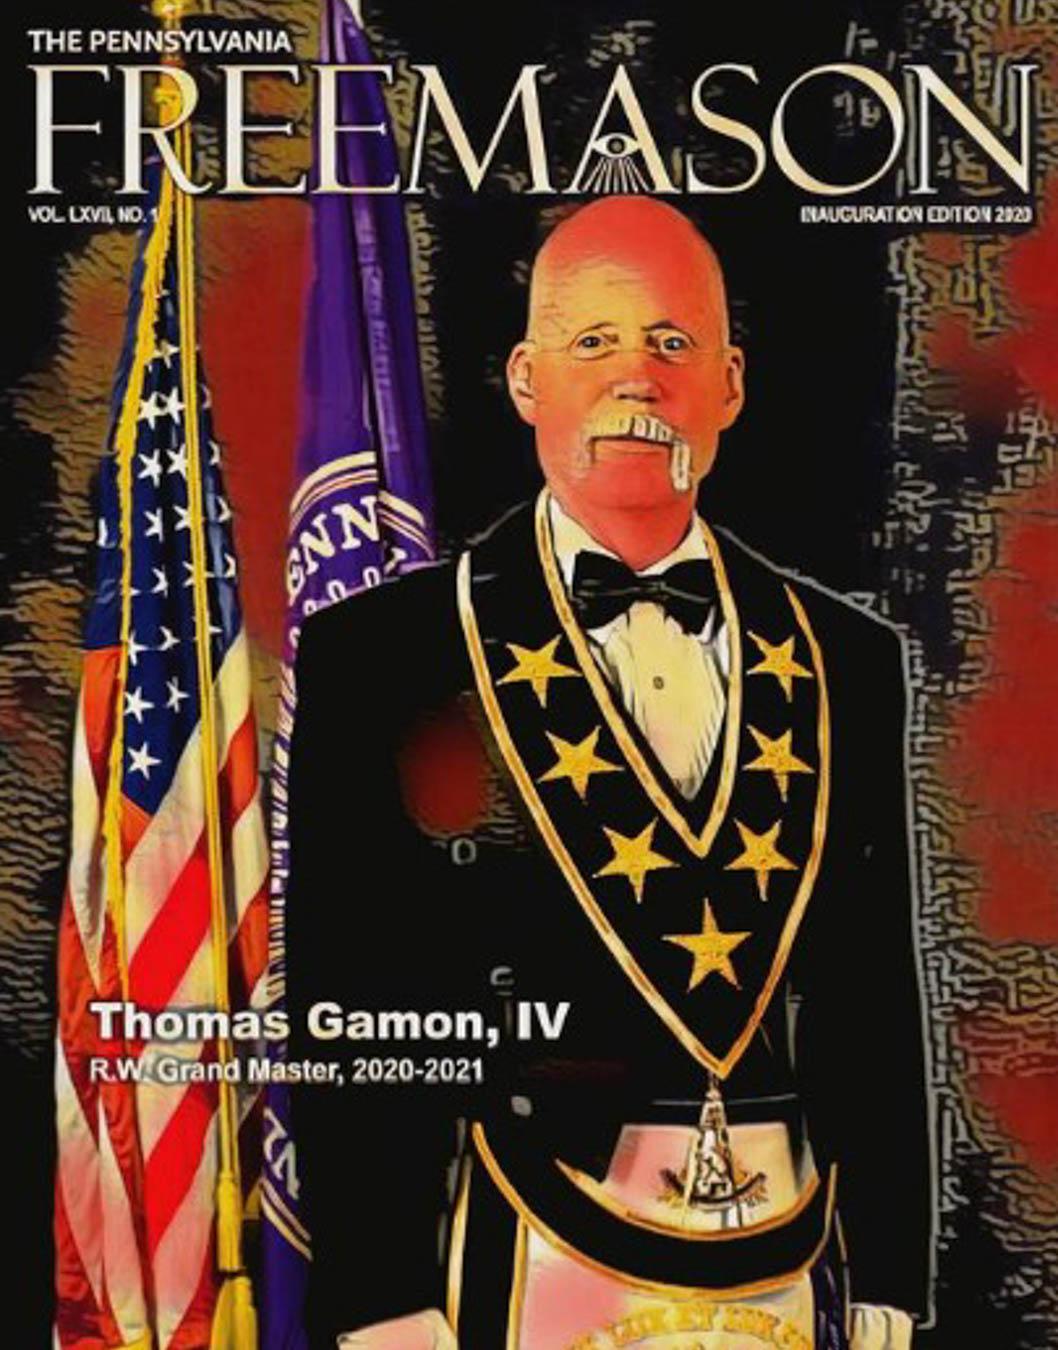 Colorized digital image of R.W. Grand Master Thomas Gamon IV.